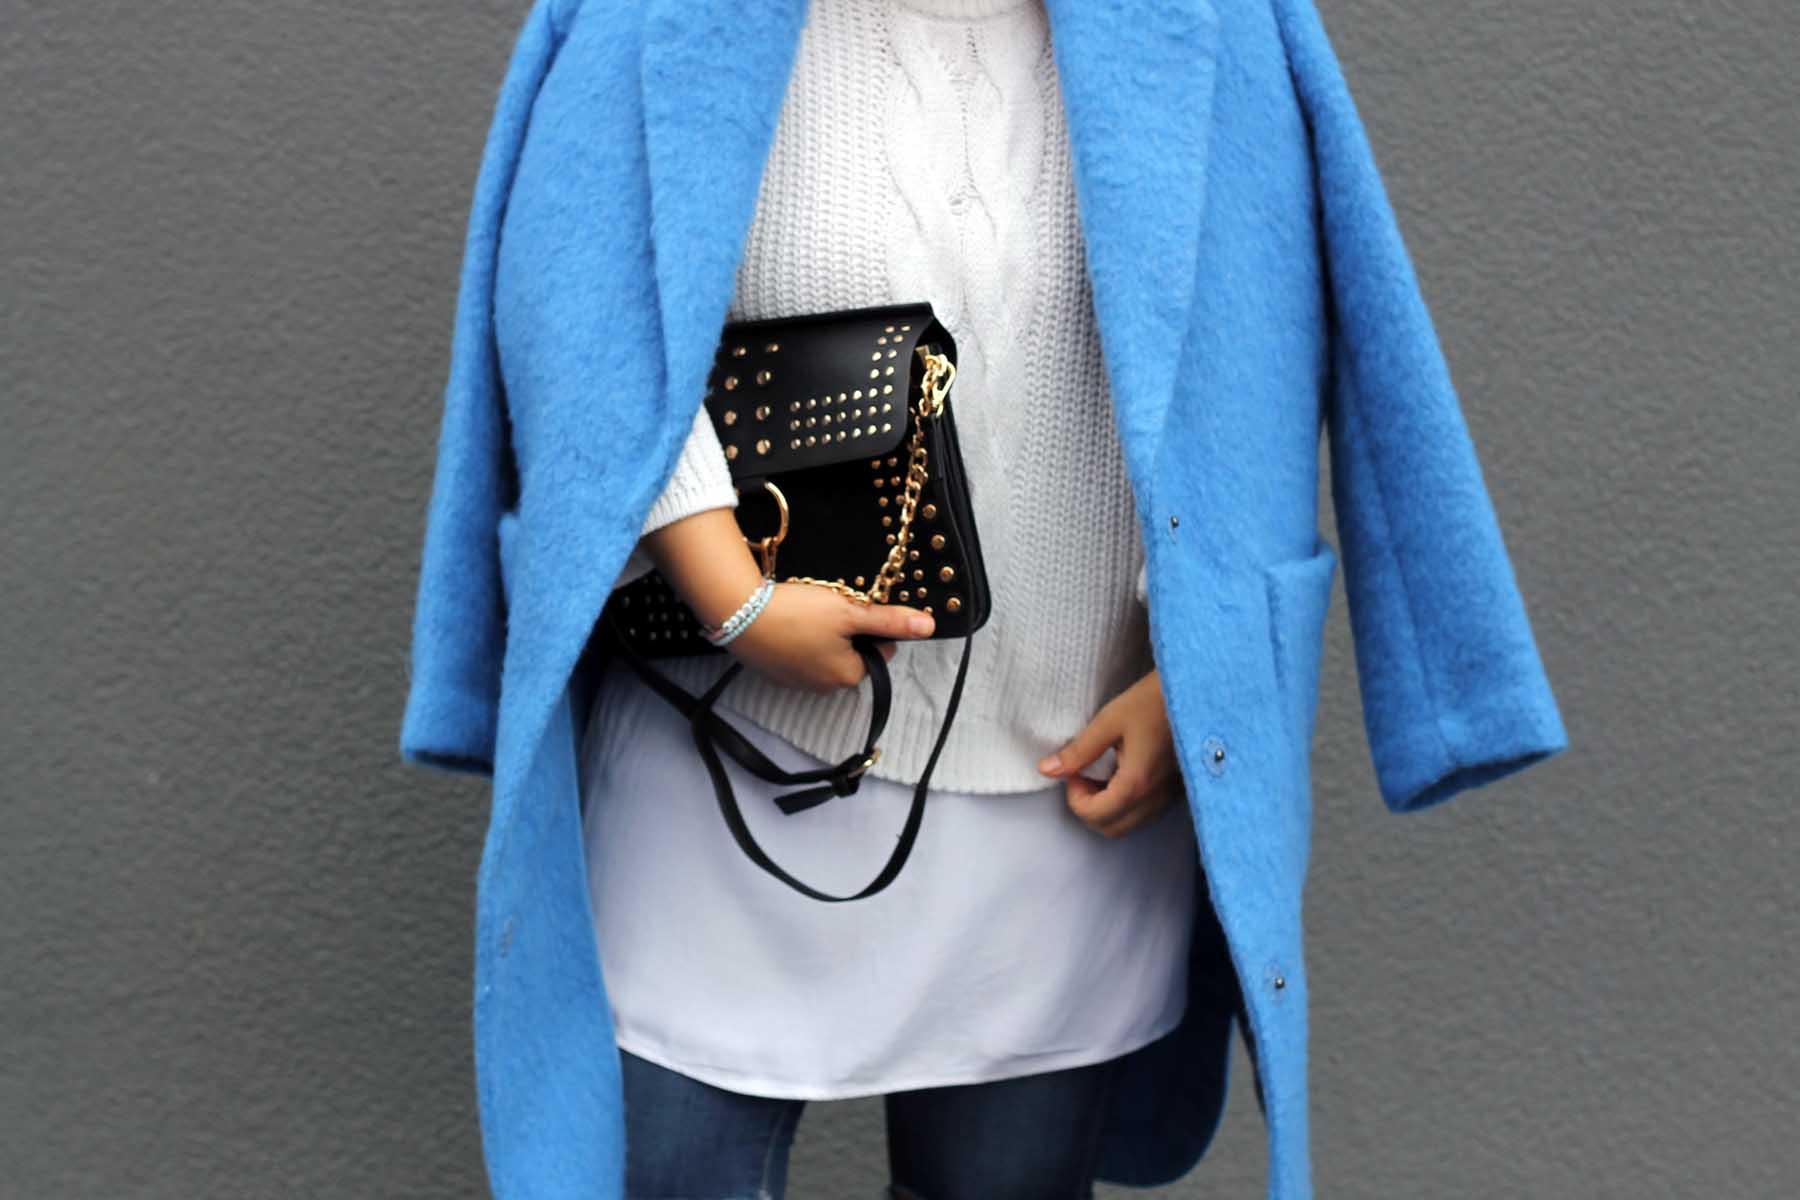 outfit-look-style-modeblog-fashionblog-blauer-mantel-jeans-balenciaga-lookalike-boots-chloe12